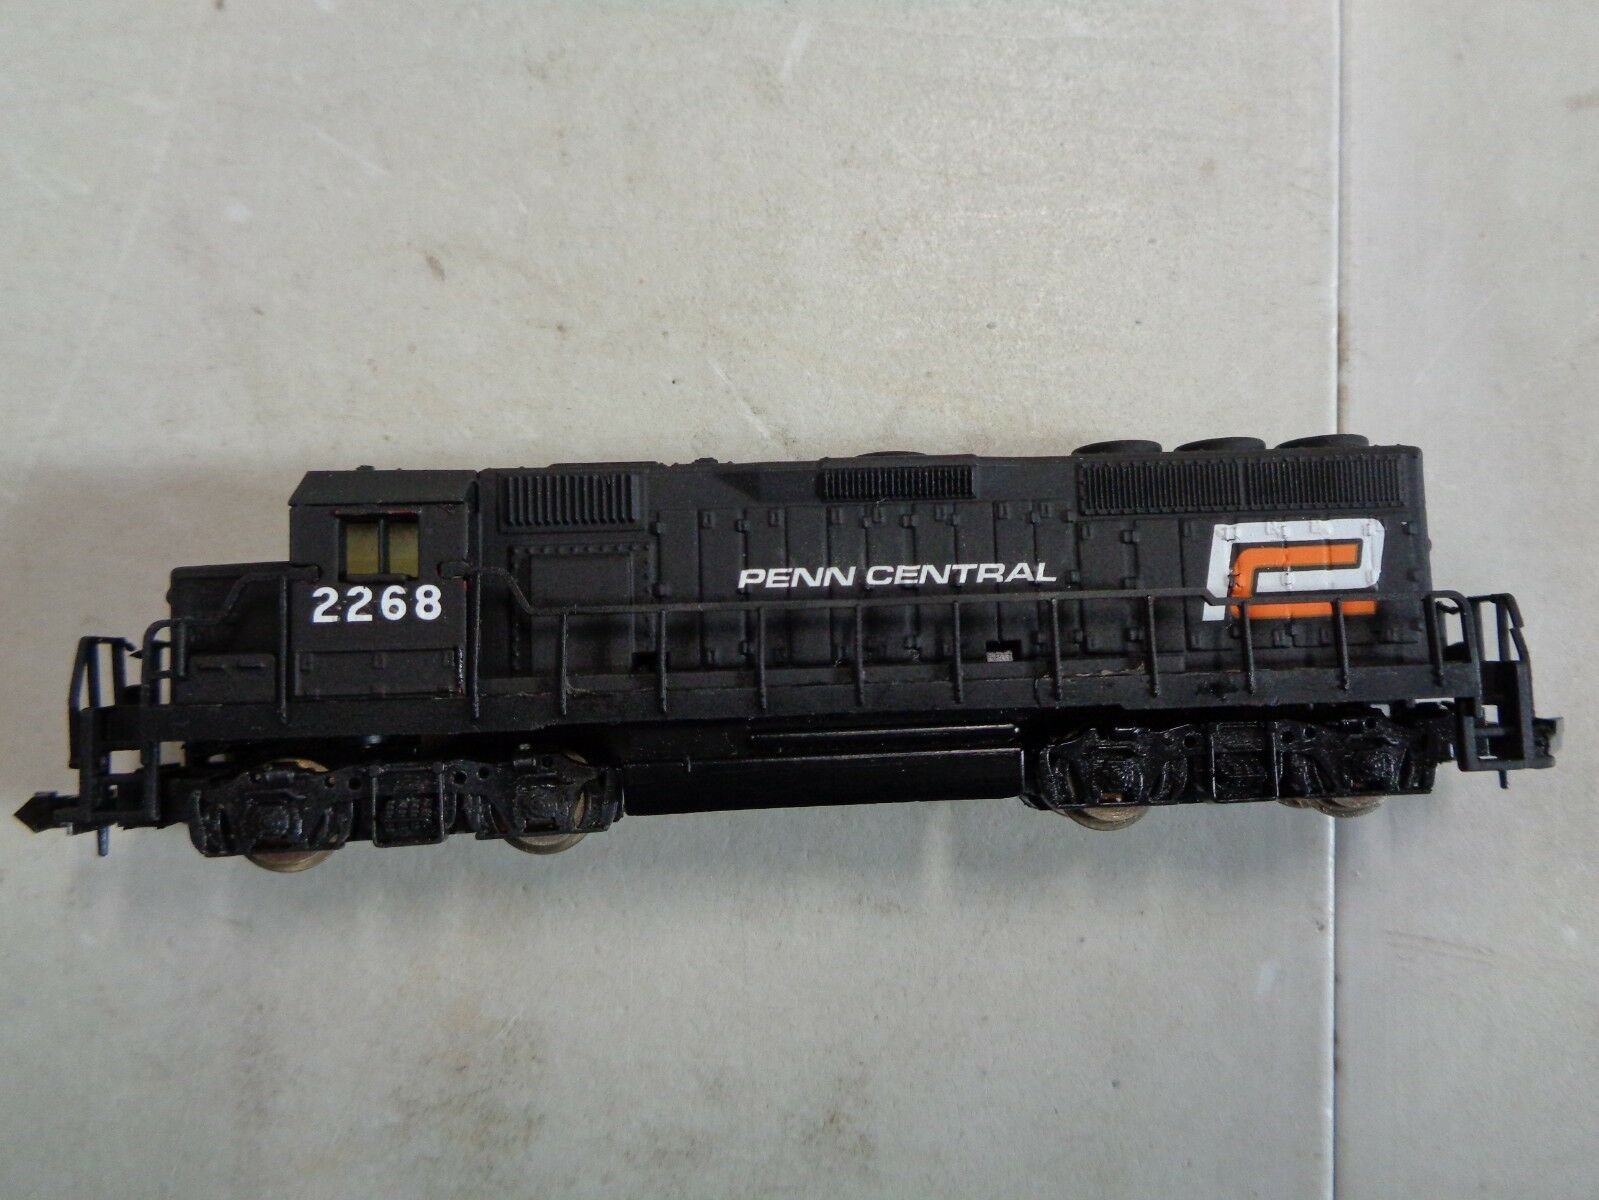 Penn Central 2268 Locomotive N Scale